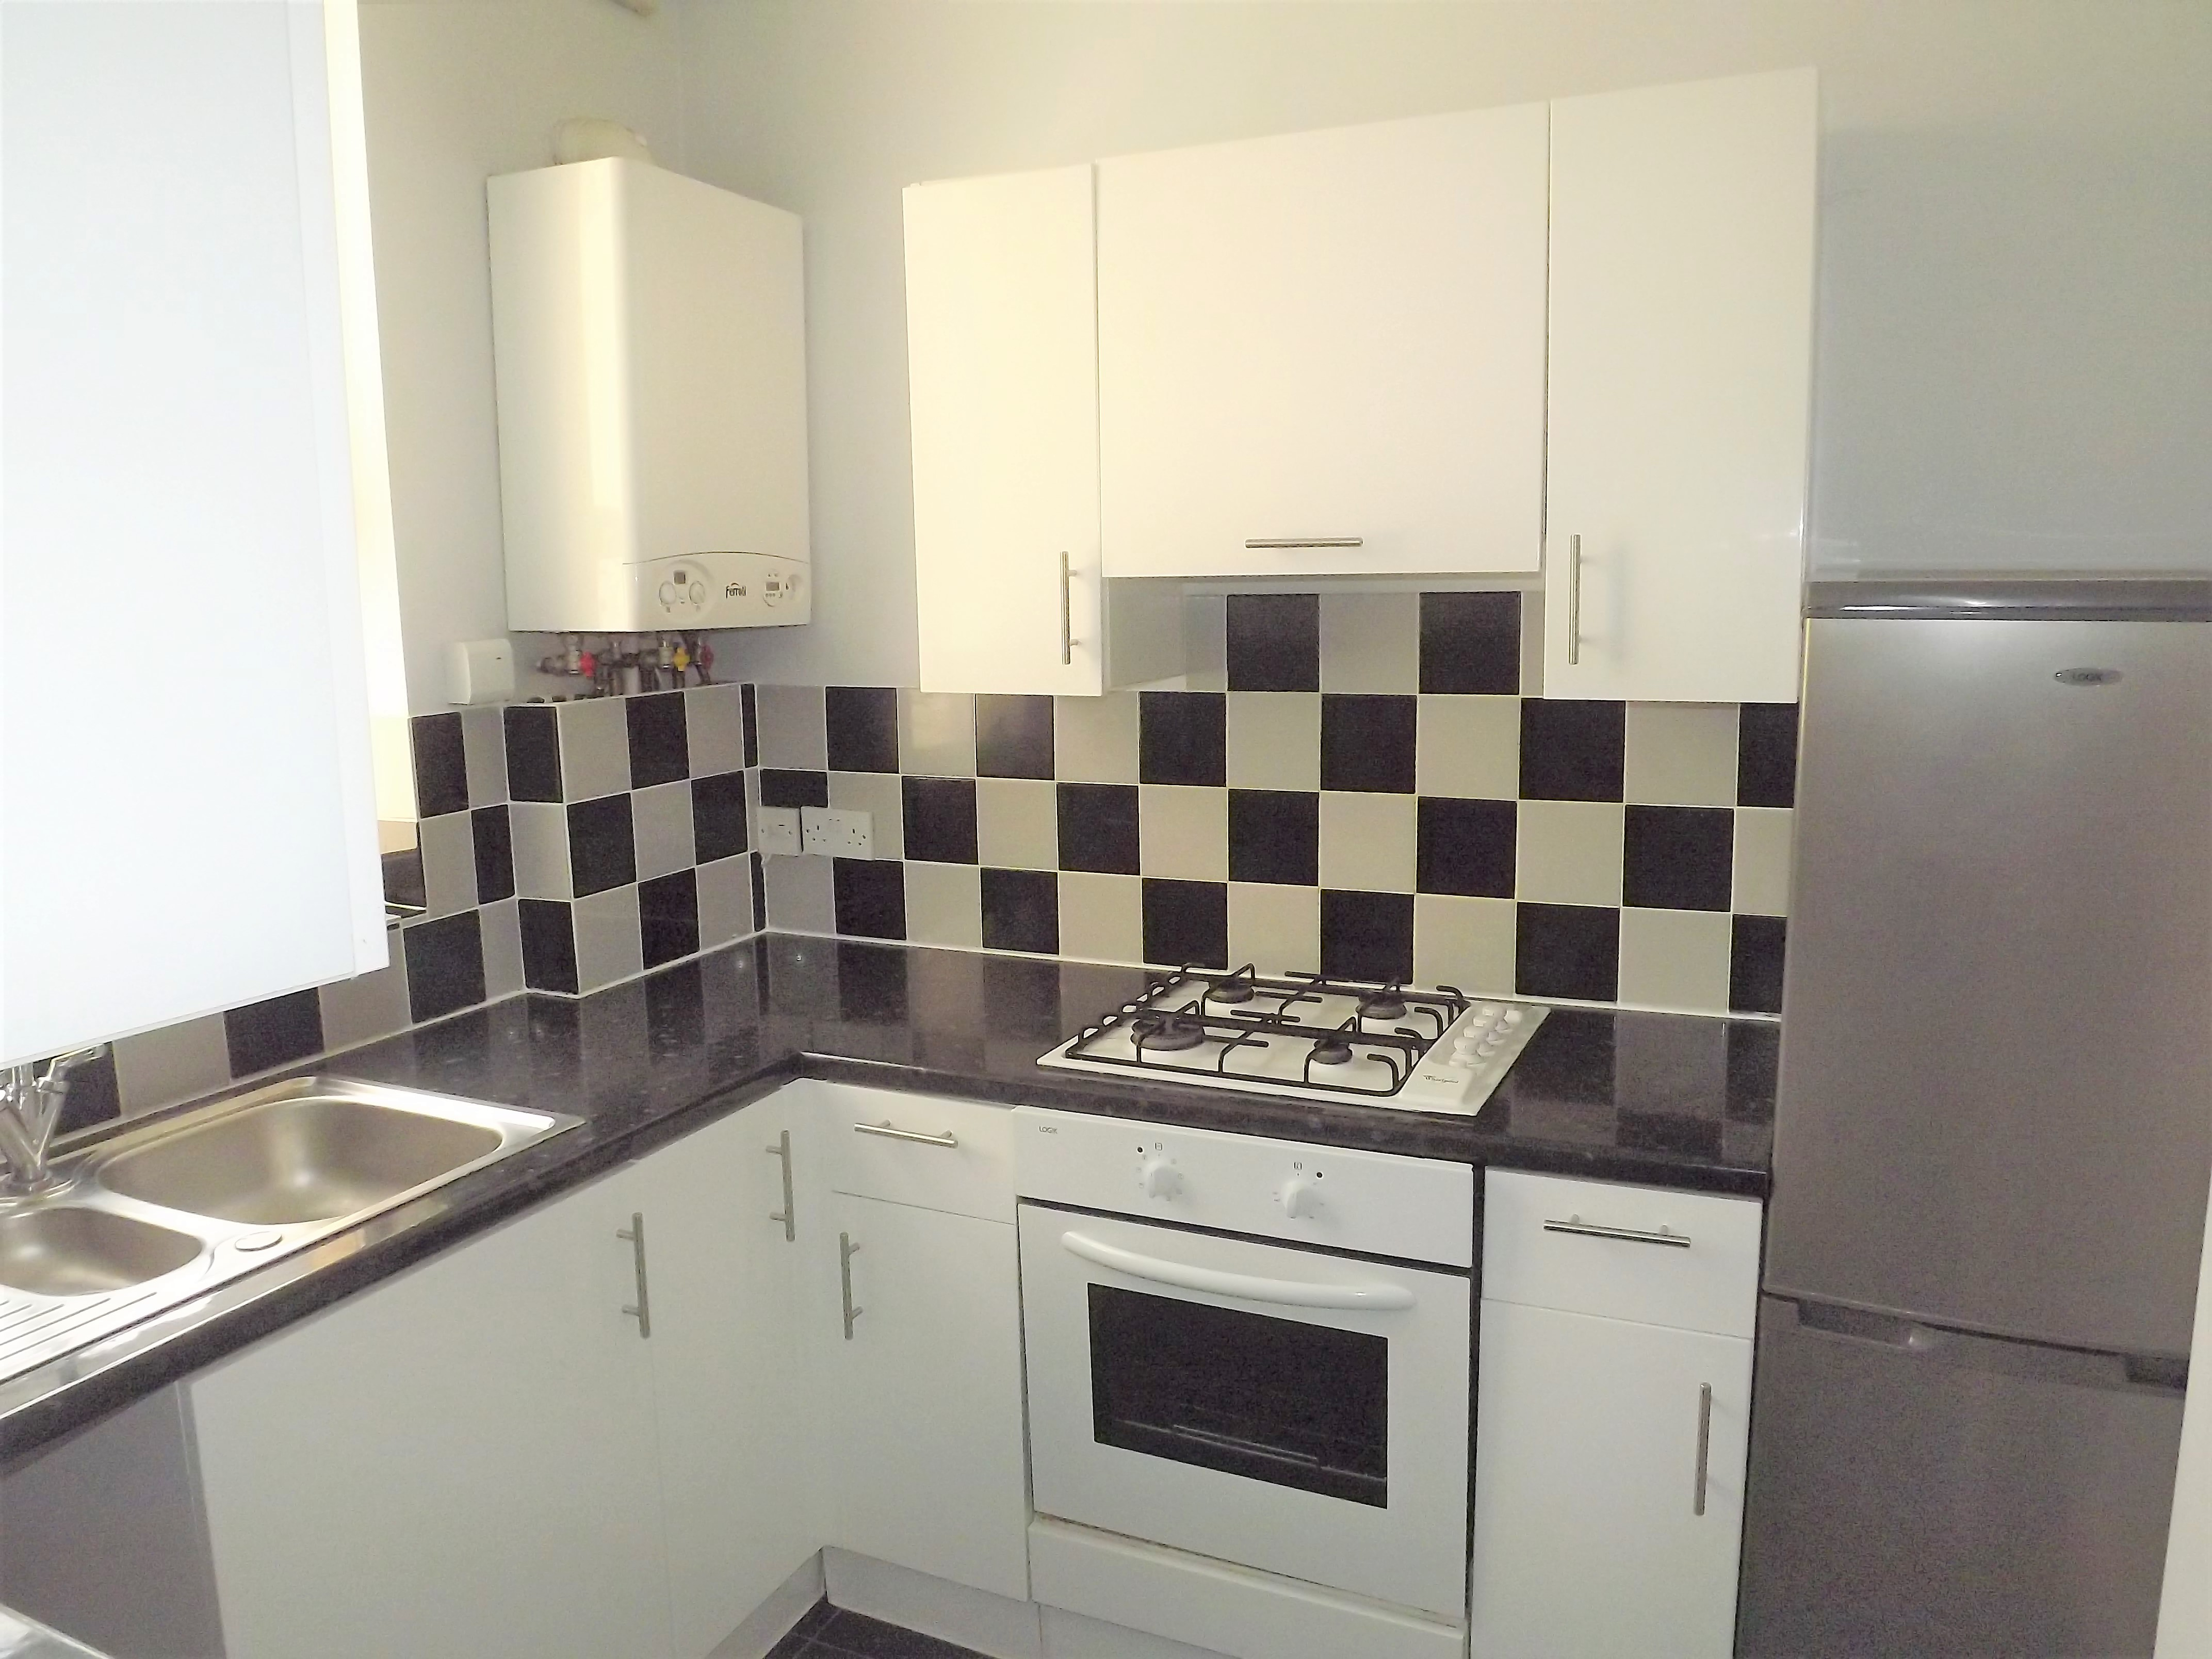 9 Hereford house kitchen